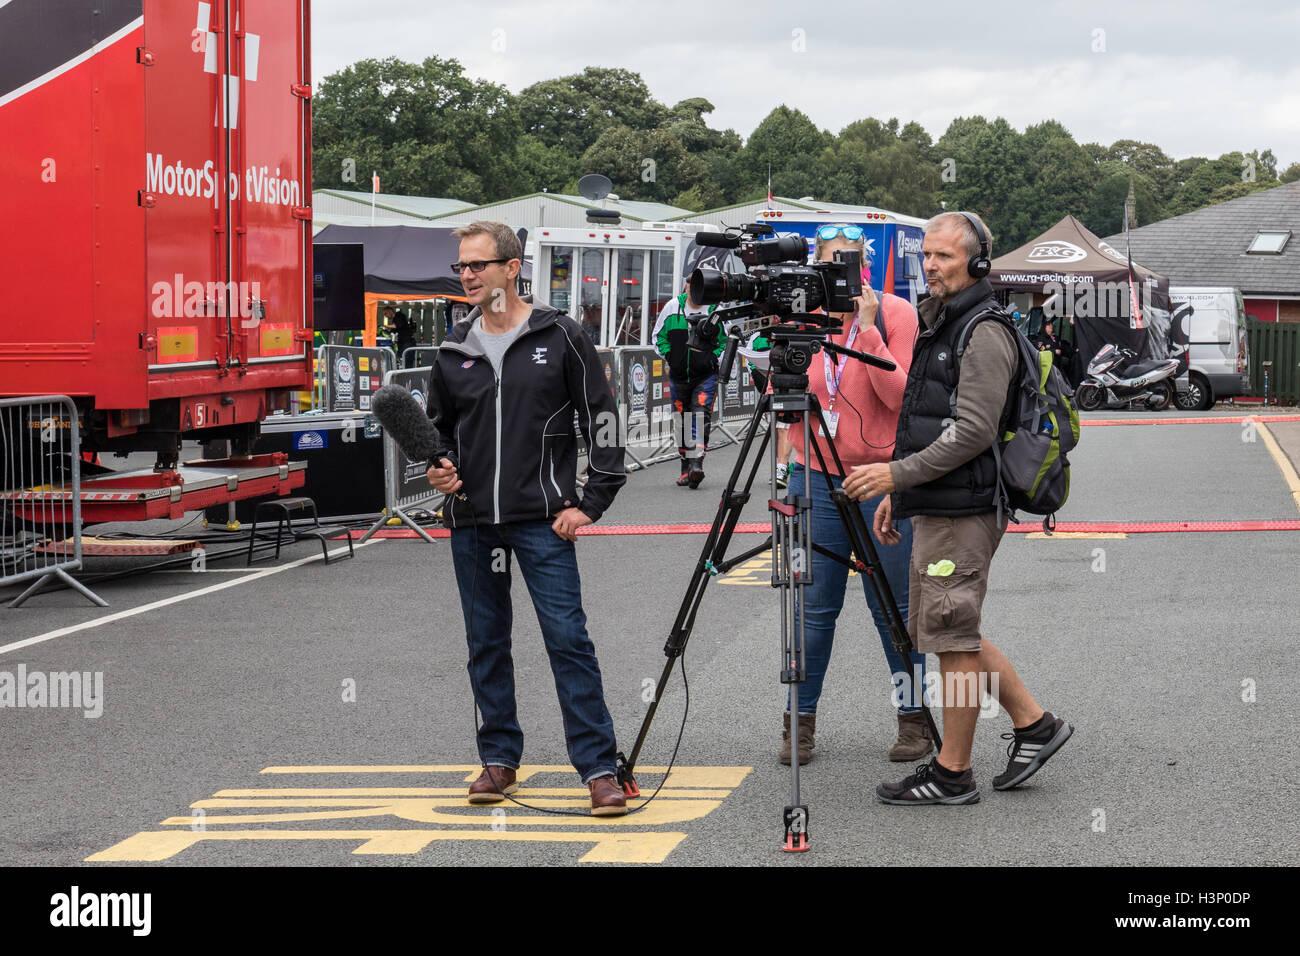 Eurosport commentator James 'Jamie' Whitham covering MCE British Superbike Championship race at Oulton Park, - Stock Image